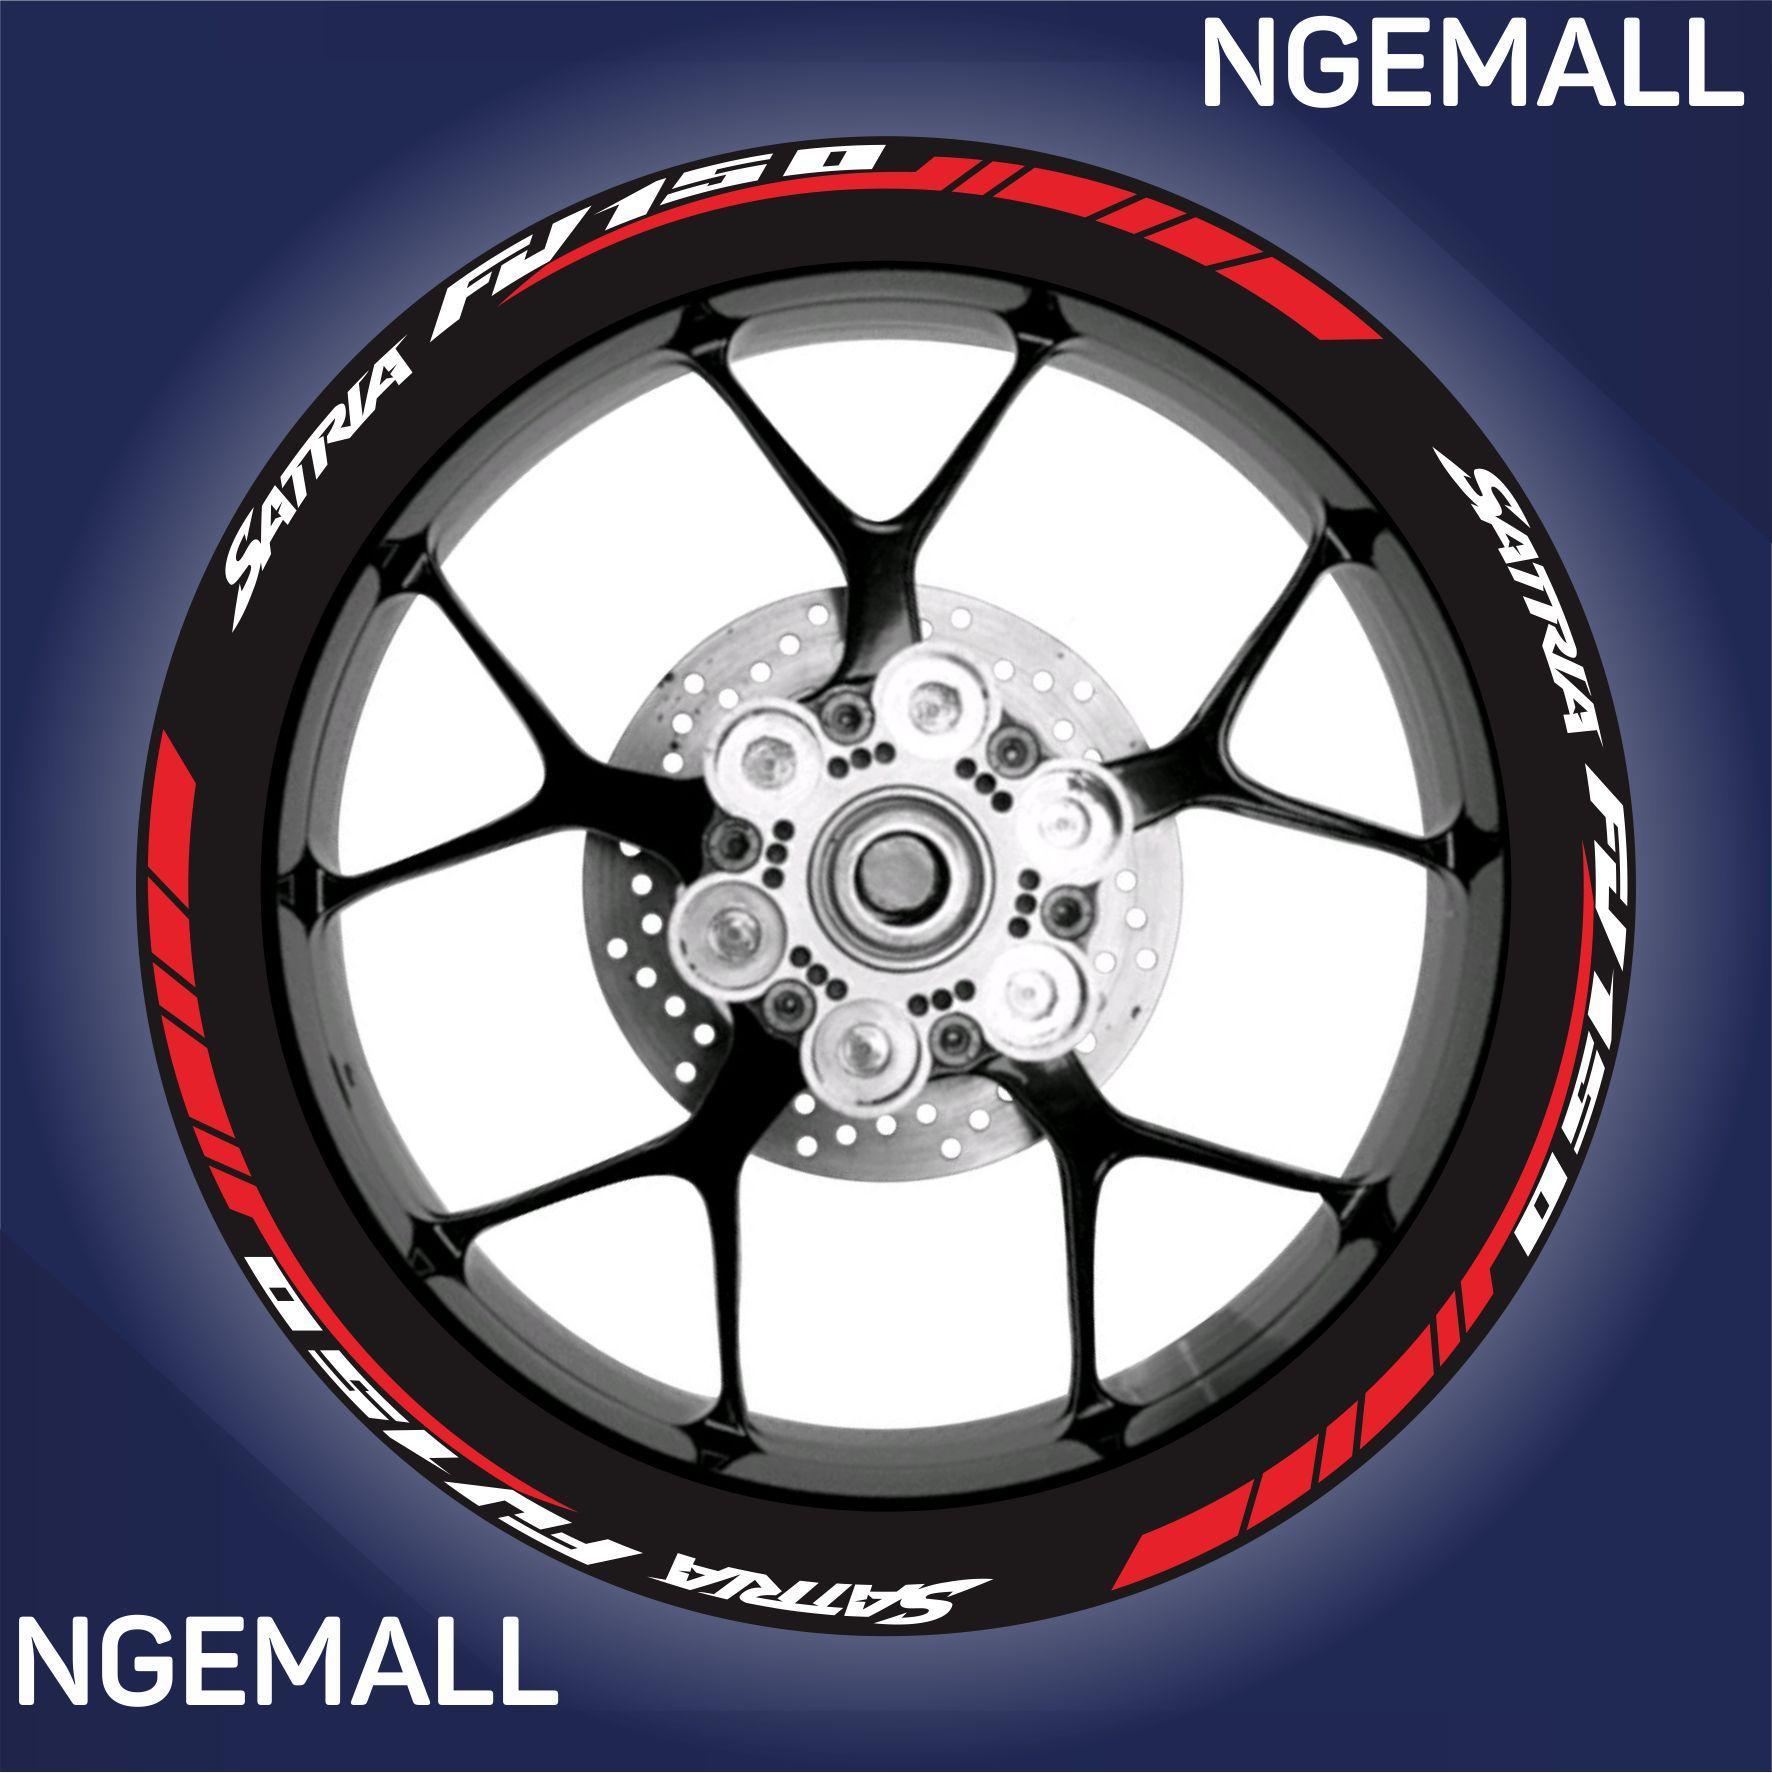 Ngemall - Aksesoris Motor Stiker Cutting 6 Velg Suzuki Satria - Merah kombinasi Putih - Ngemall